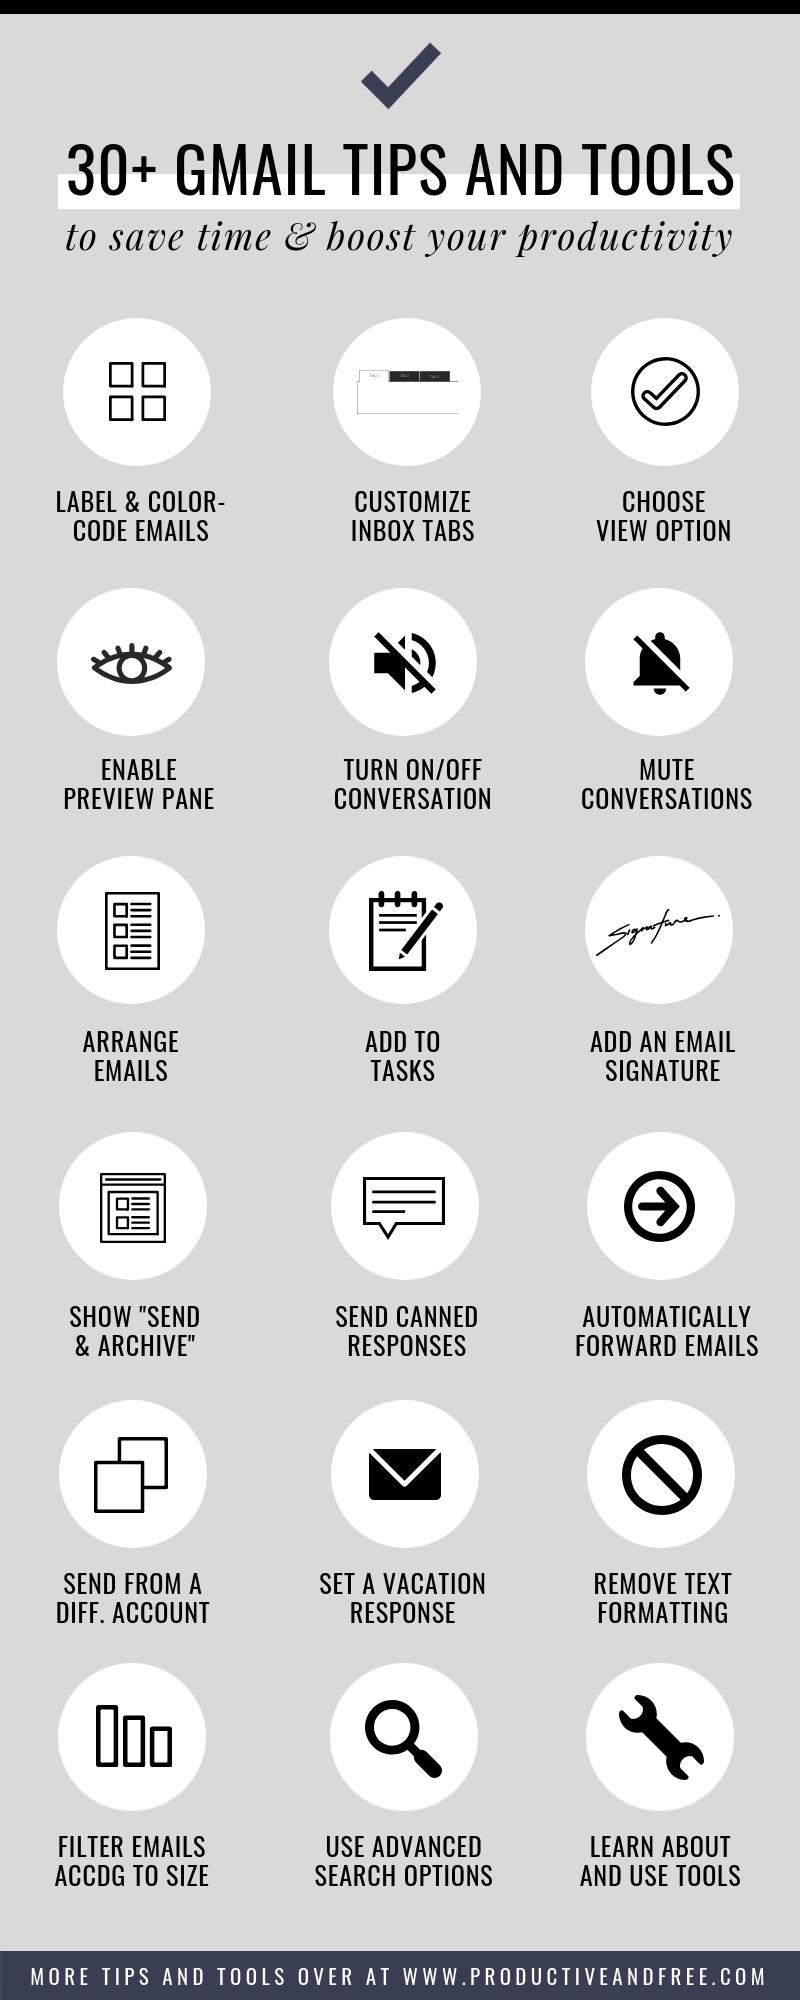 30+ Gmail Tips and Tools | ProductiveandFree.com